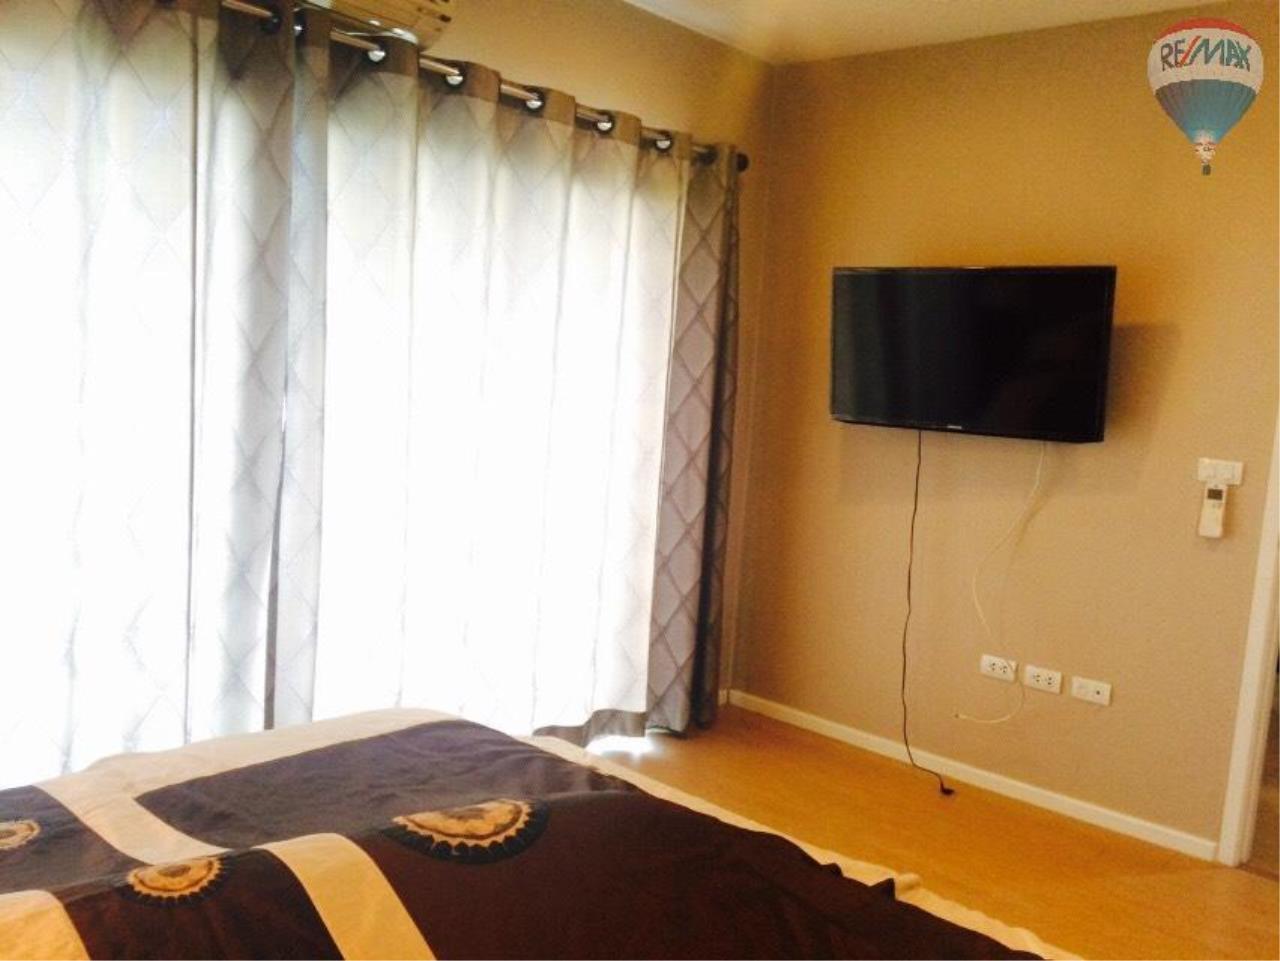 RE/MAX Properties Agency's Condominium for rent 2 bedrooms 92 Sq.m. at Renova Residence 12